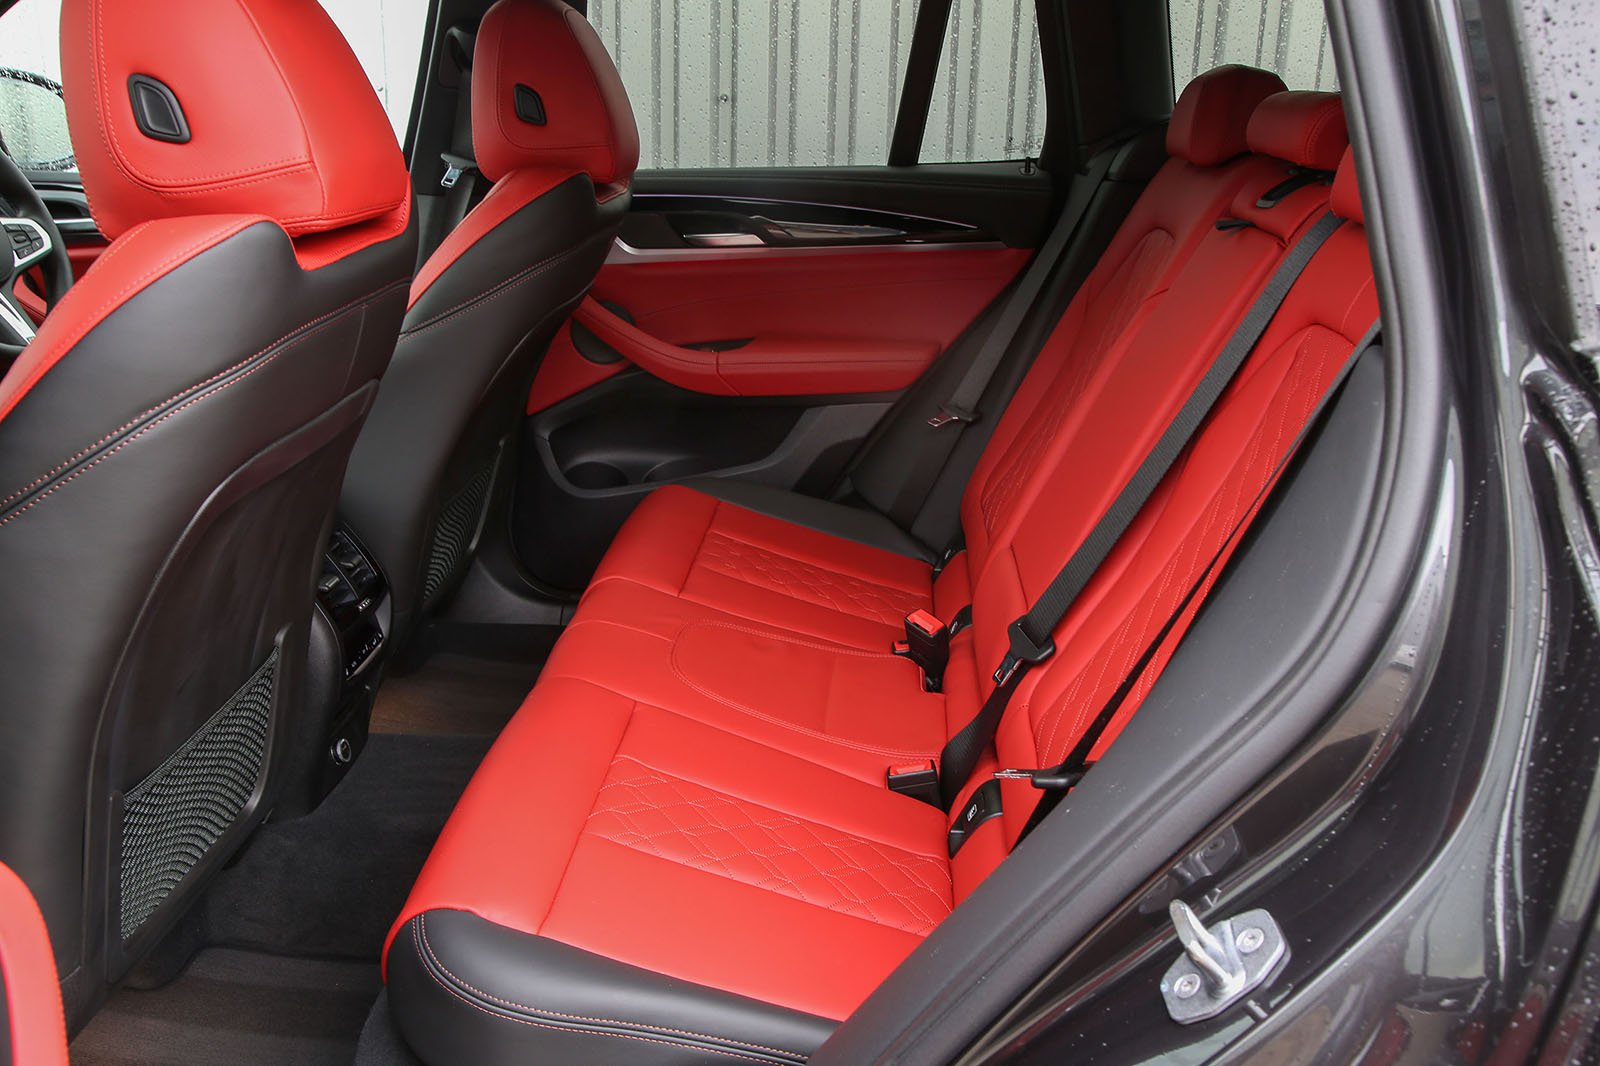 BMW X3 2021 M40i rear seats